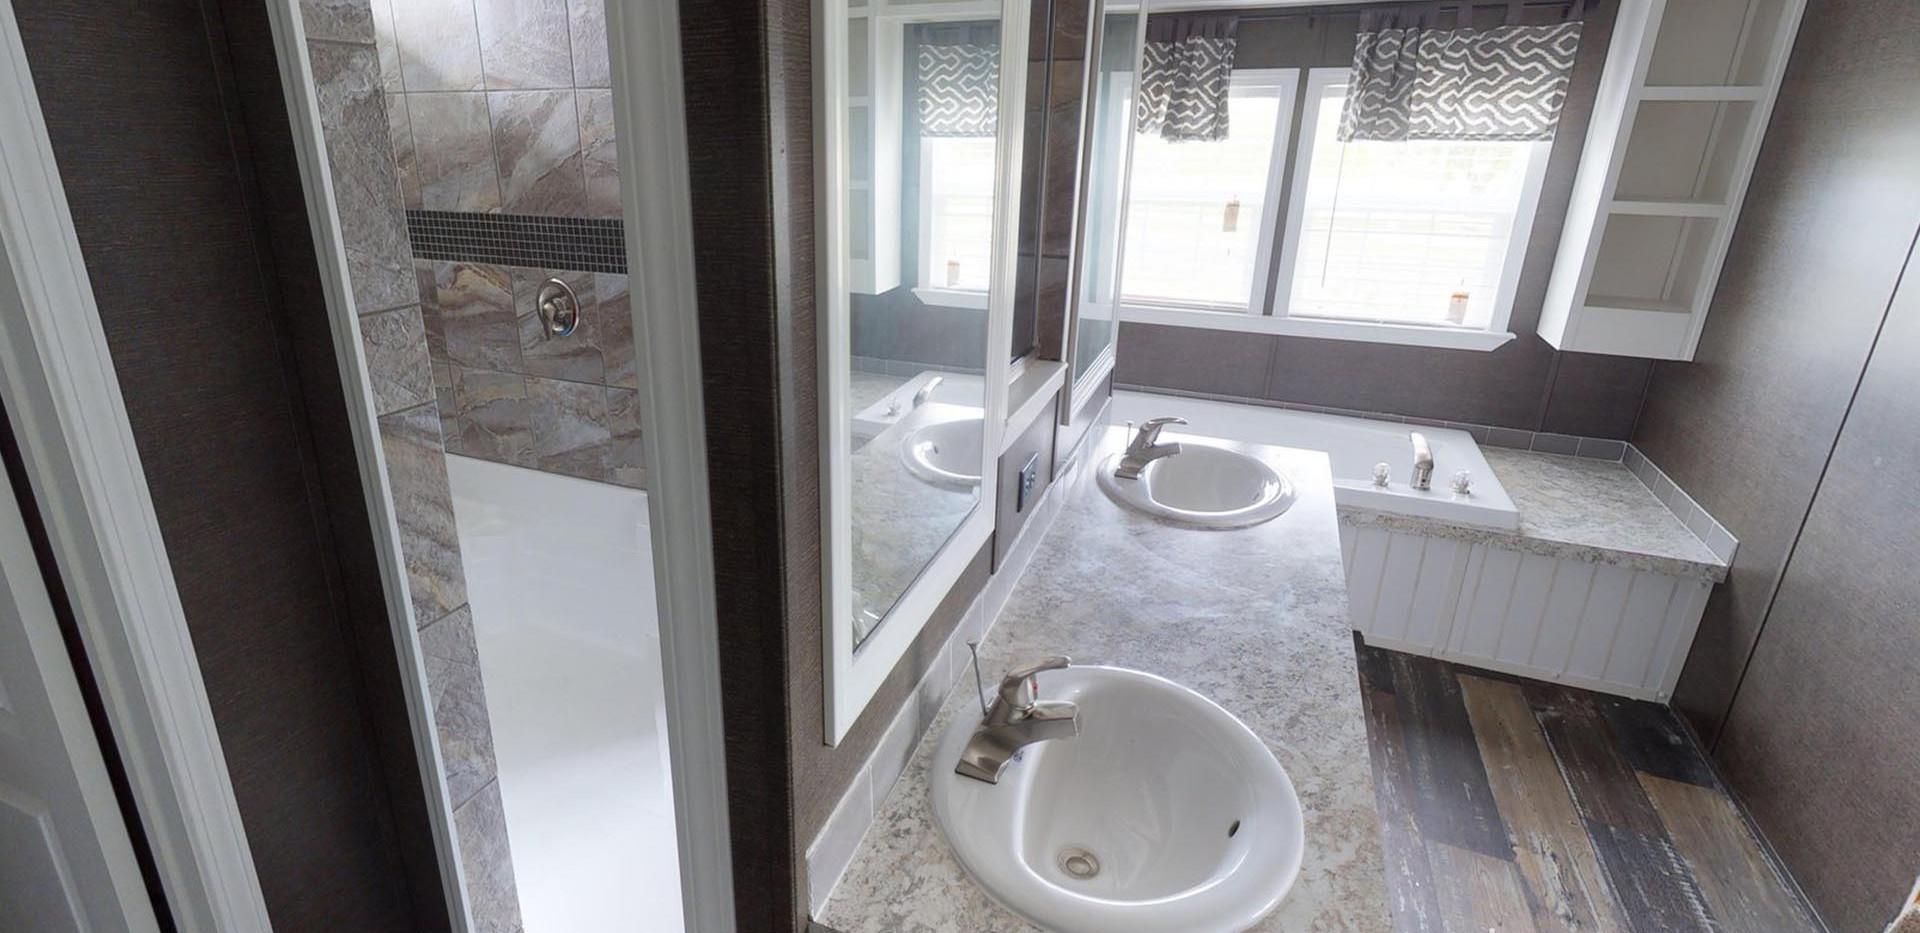 Fossil-Creek-The-Drake-bathroom-2.jpg